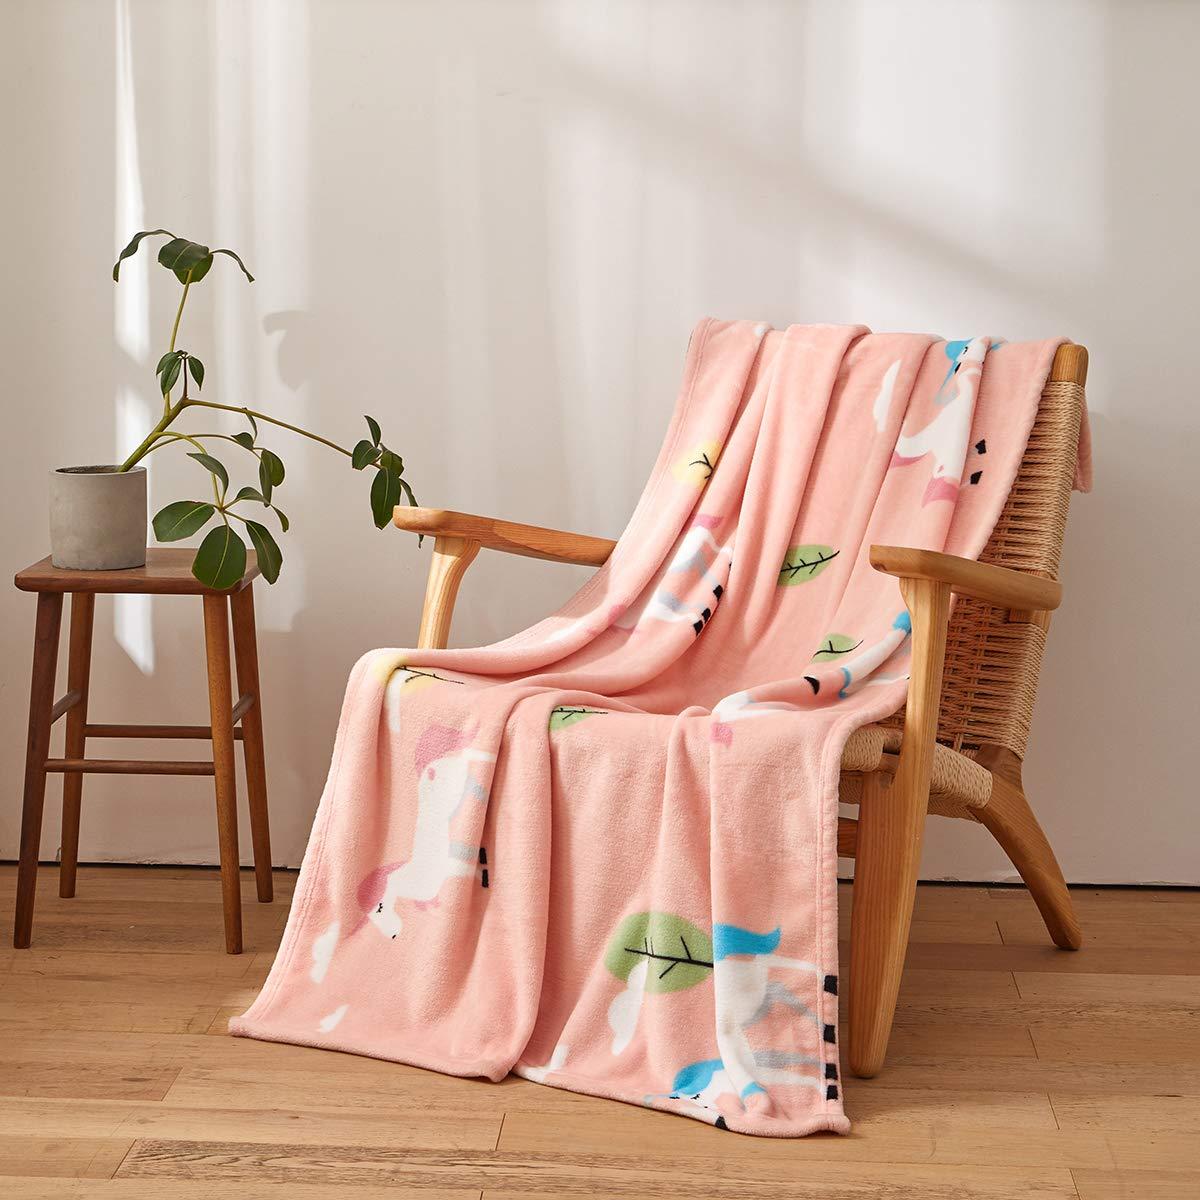 Unicorn Pink Flannel Fleece Blanket for Baby Girl, Soft Warm Cozy Toddler Blanket & Receiving Blanket for Infant or Newborn,(39 x 57 in)